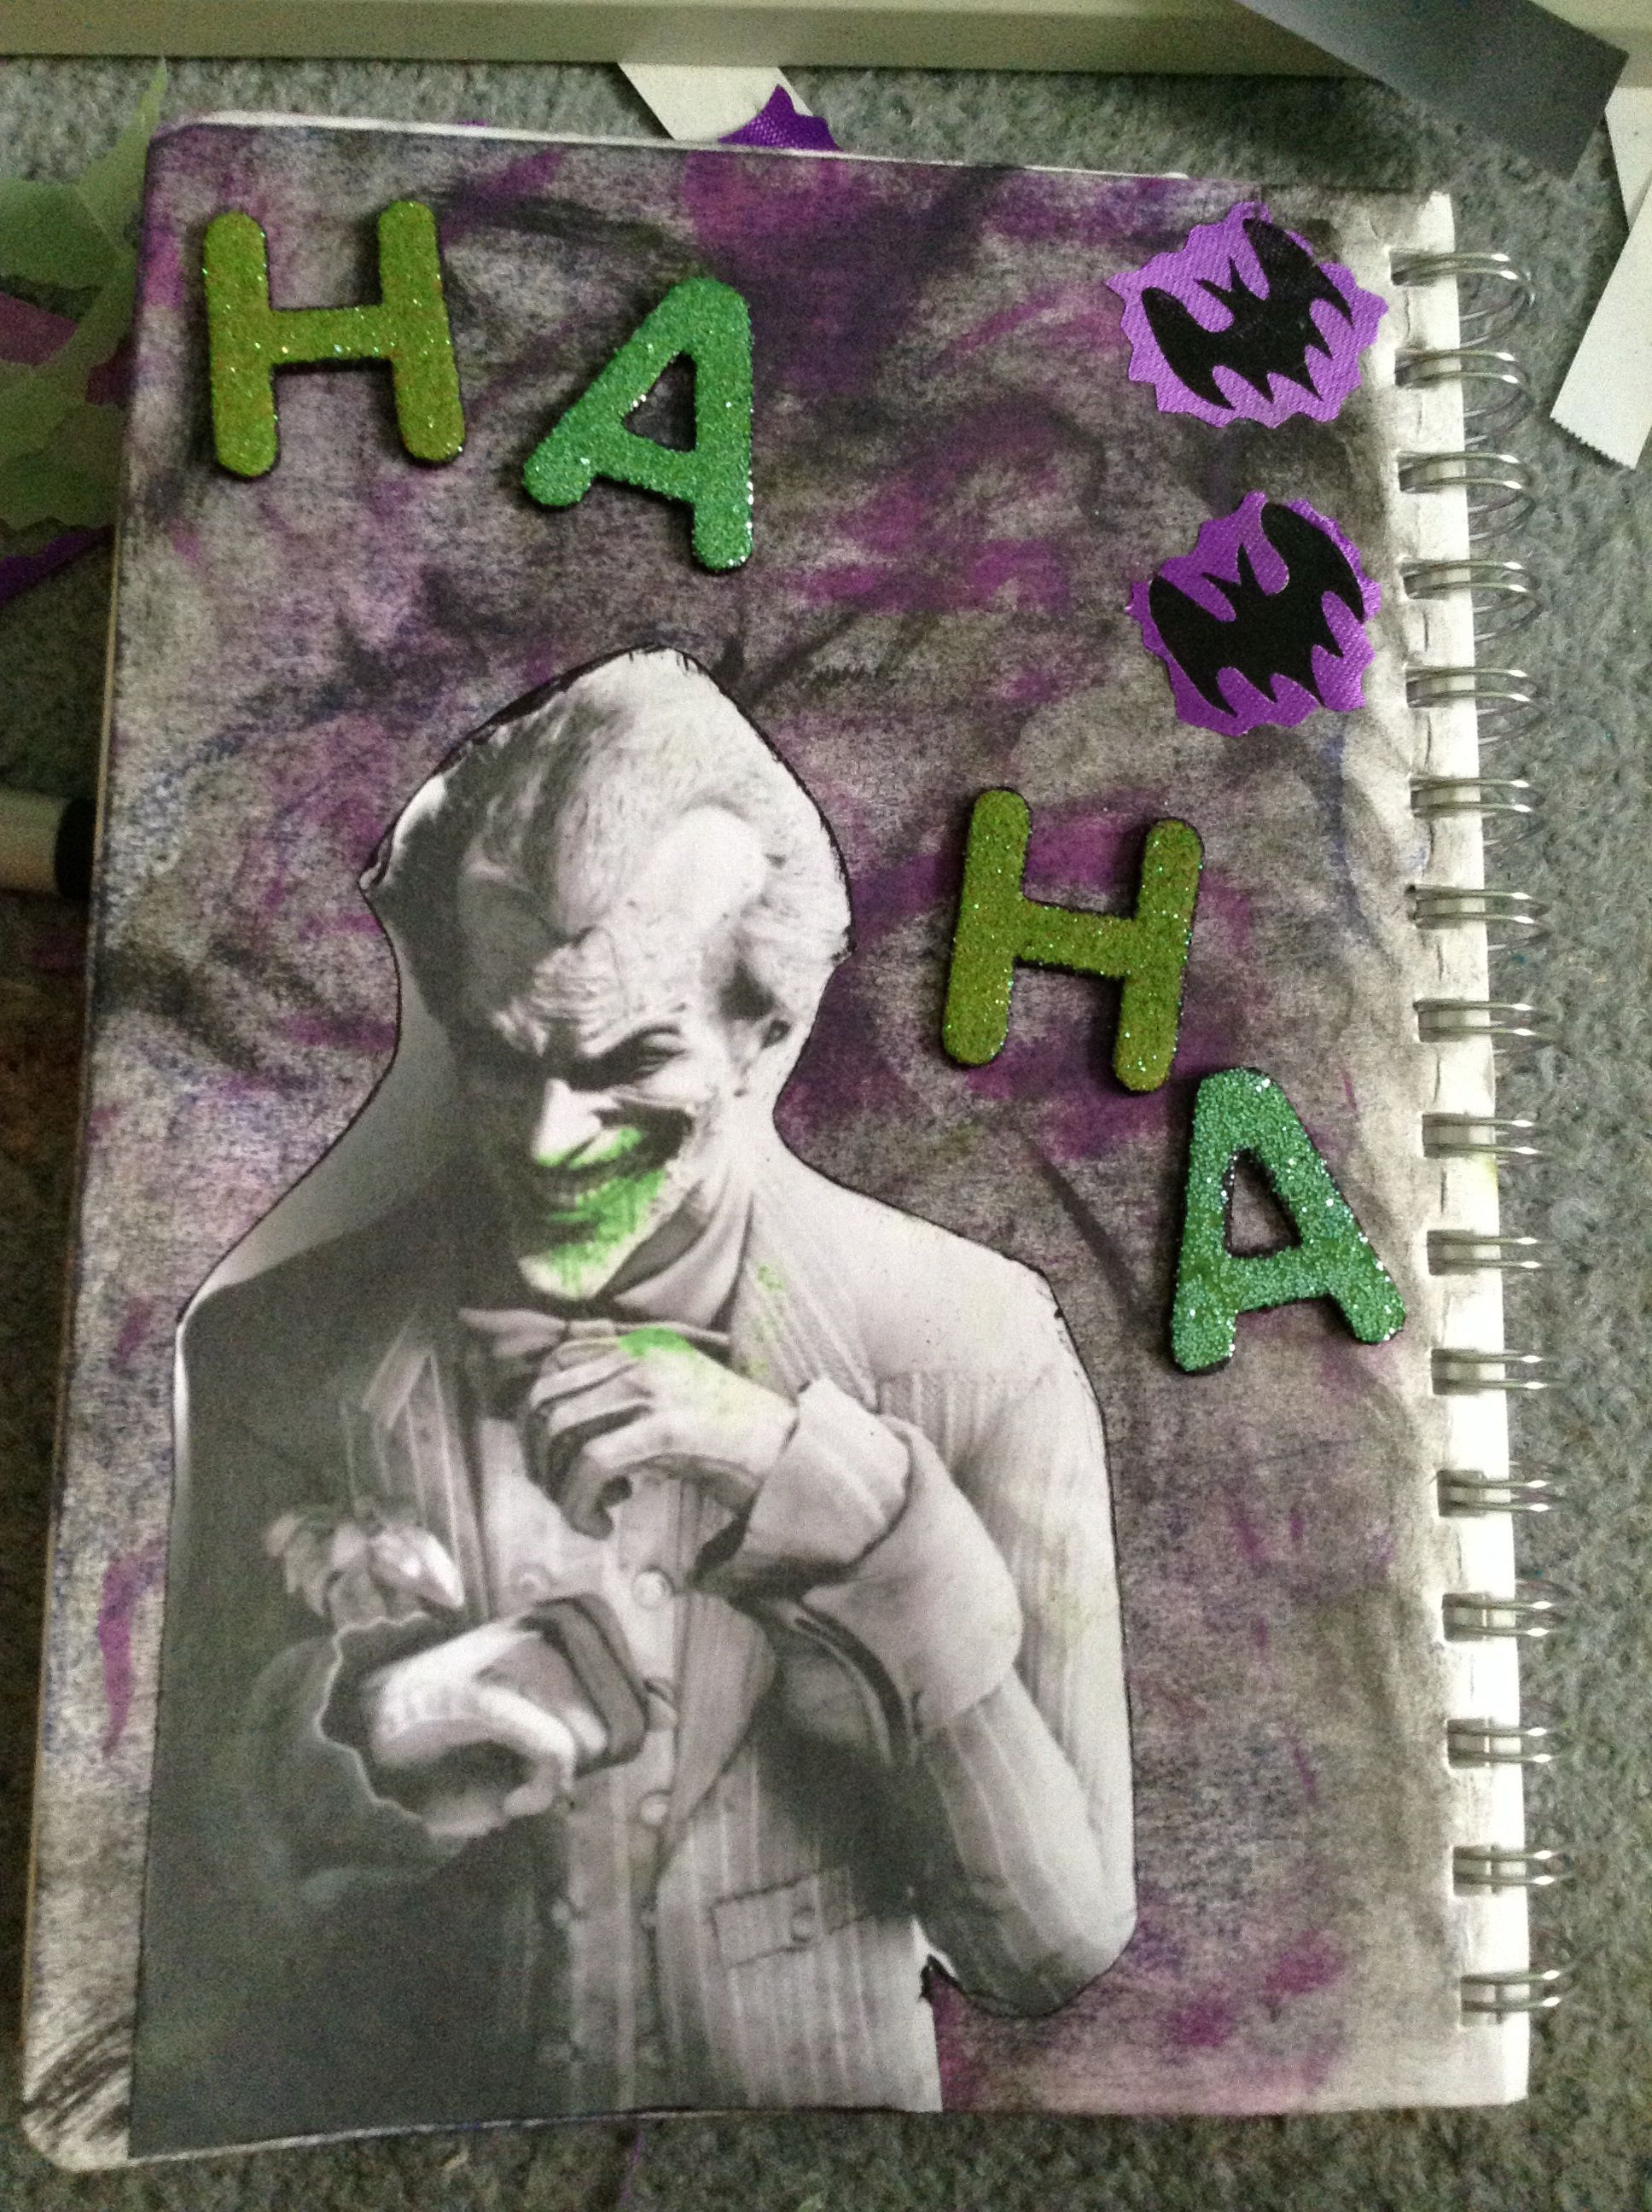 Smash book idea: favorite Villain, The Joker from Batman: Arkham video games.